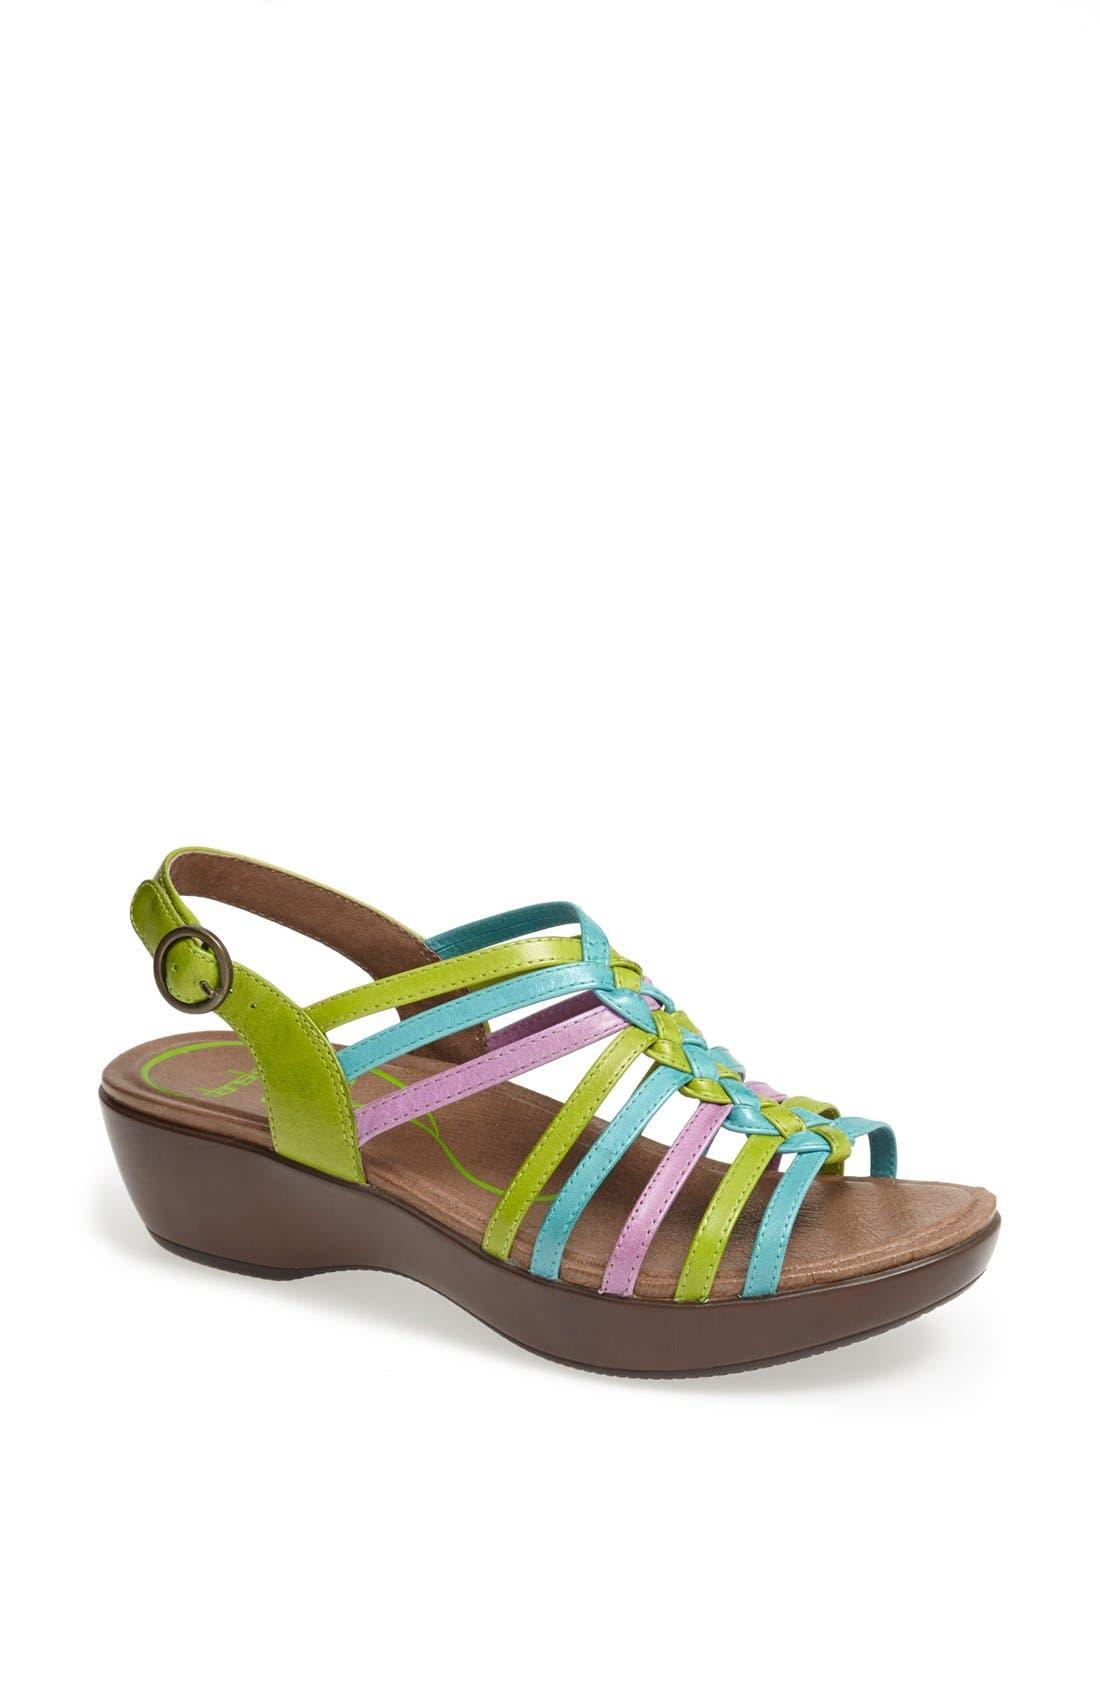 Alternate Image 1 Selected - Dansko 'Dana' Sandal